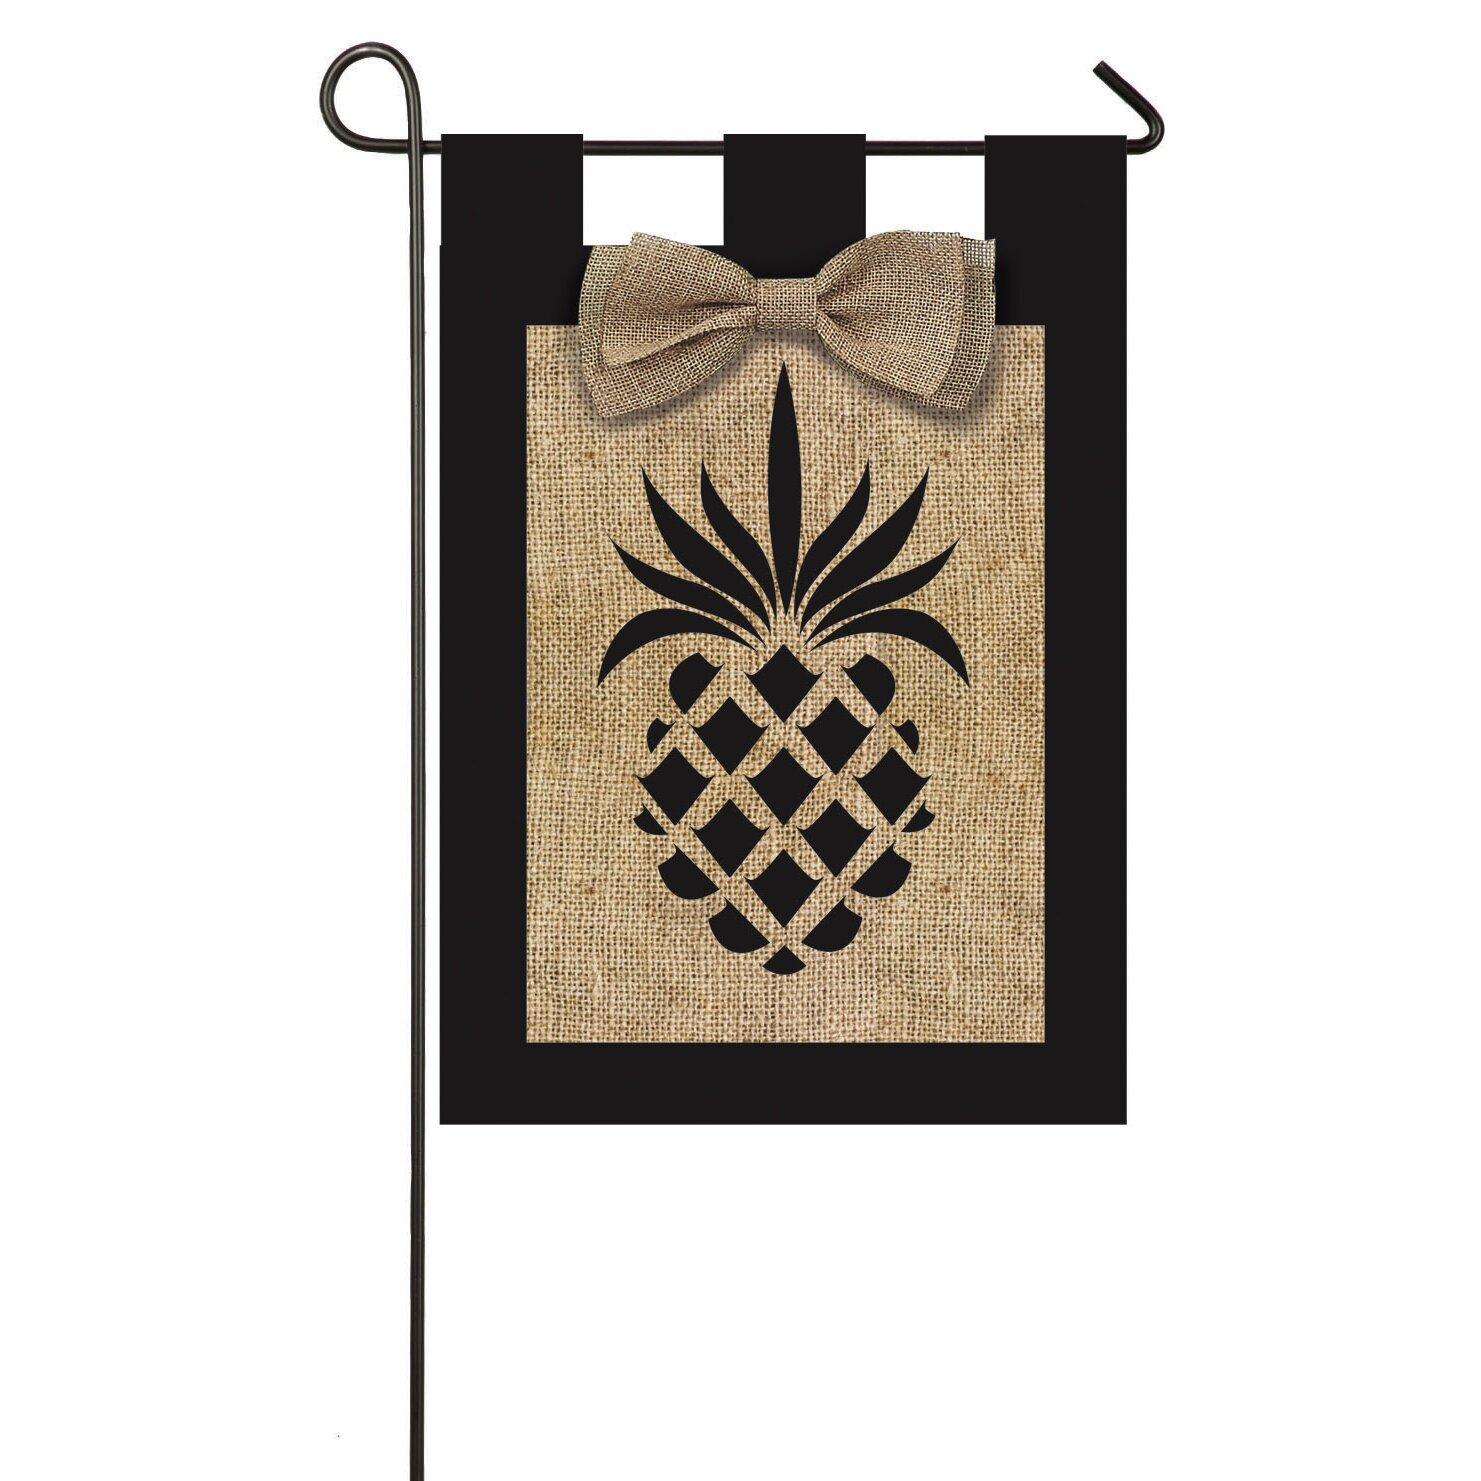 Evergreen Flag Garden Pineapple Garden Flag Reviews Wayfair